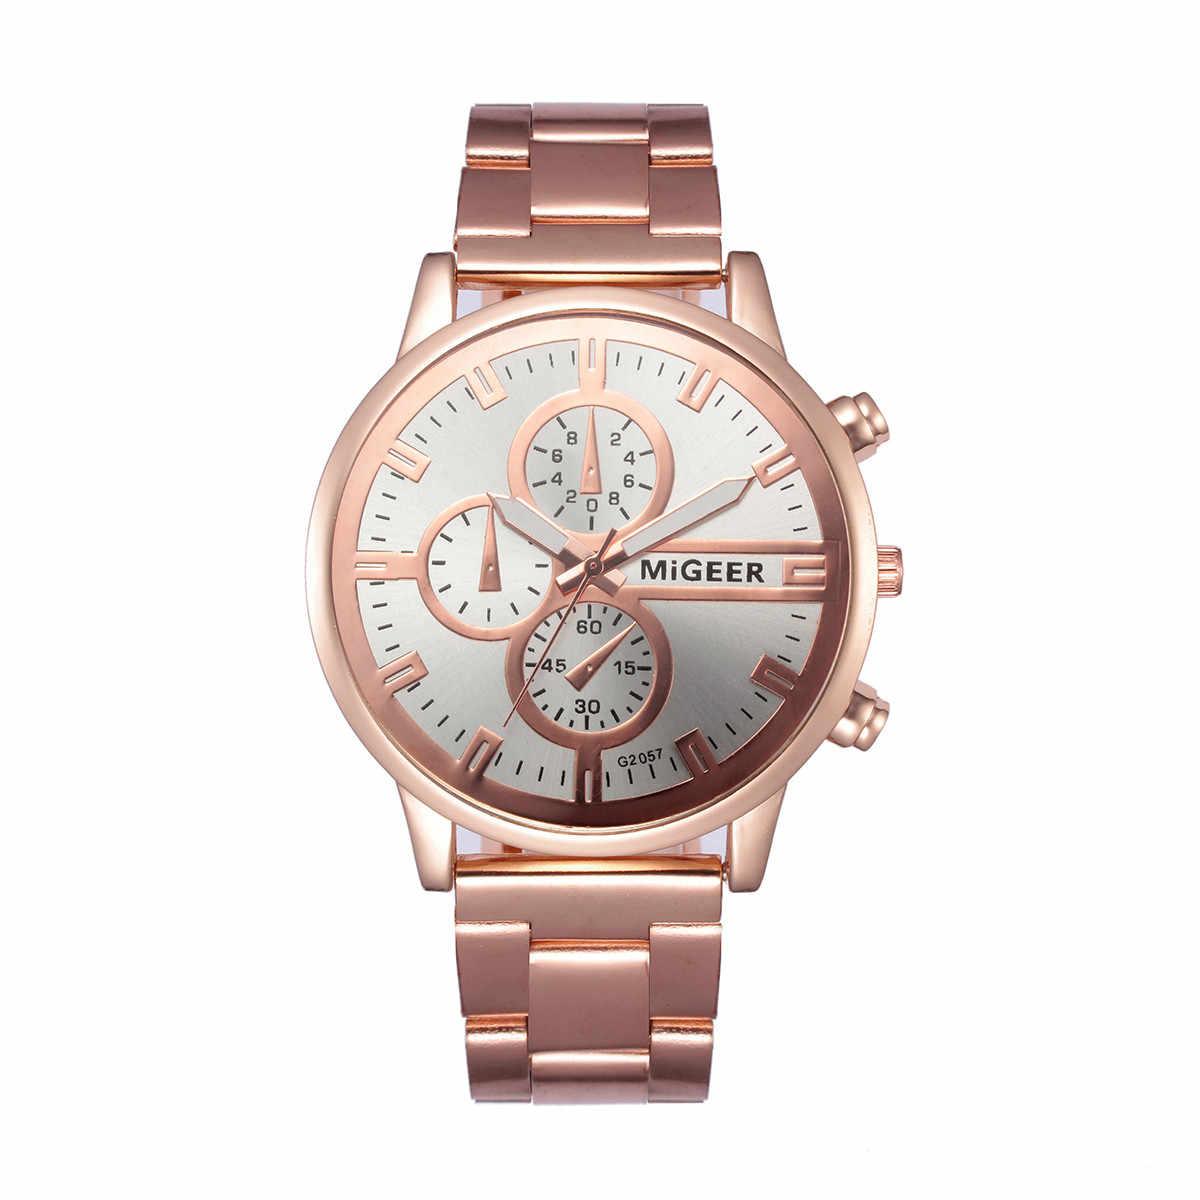 Mode hommes cristal acier inoxydable analogique Quartz montre Bracelet de luxe montres femmes rose or horloge murale erkek saat